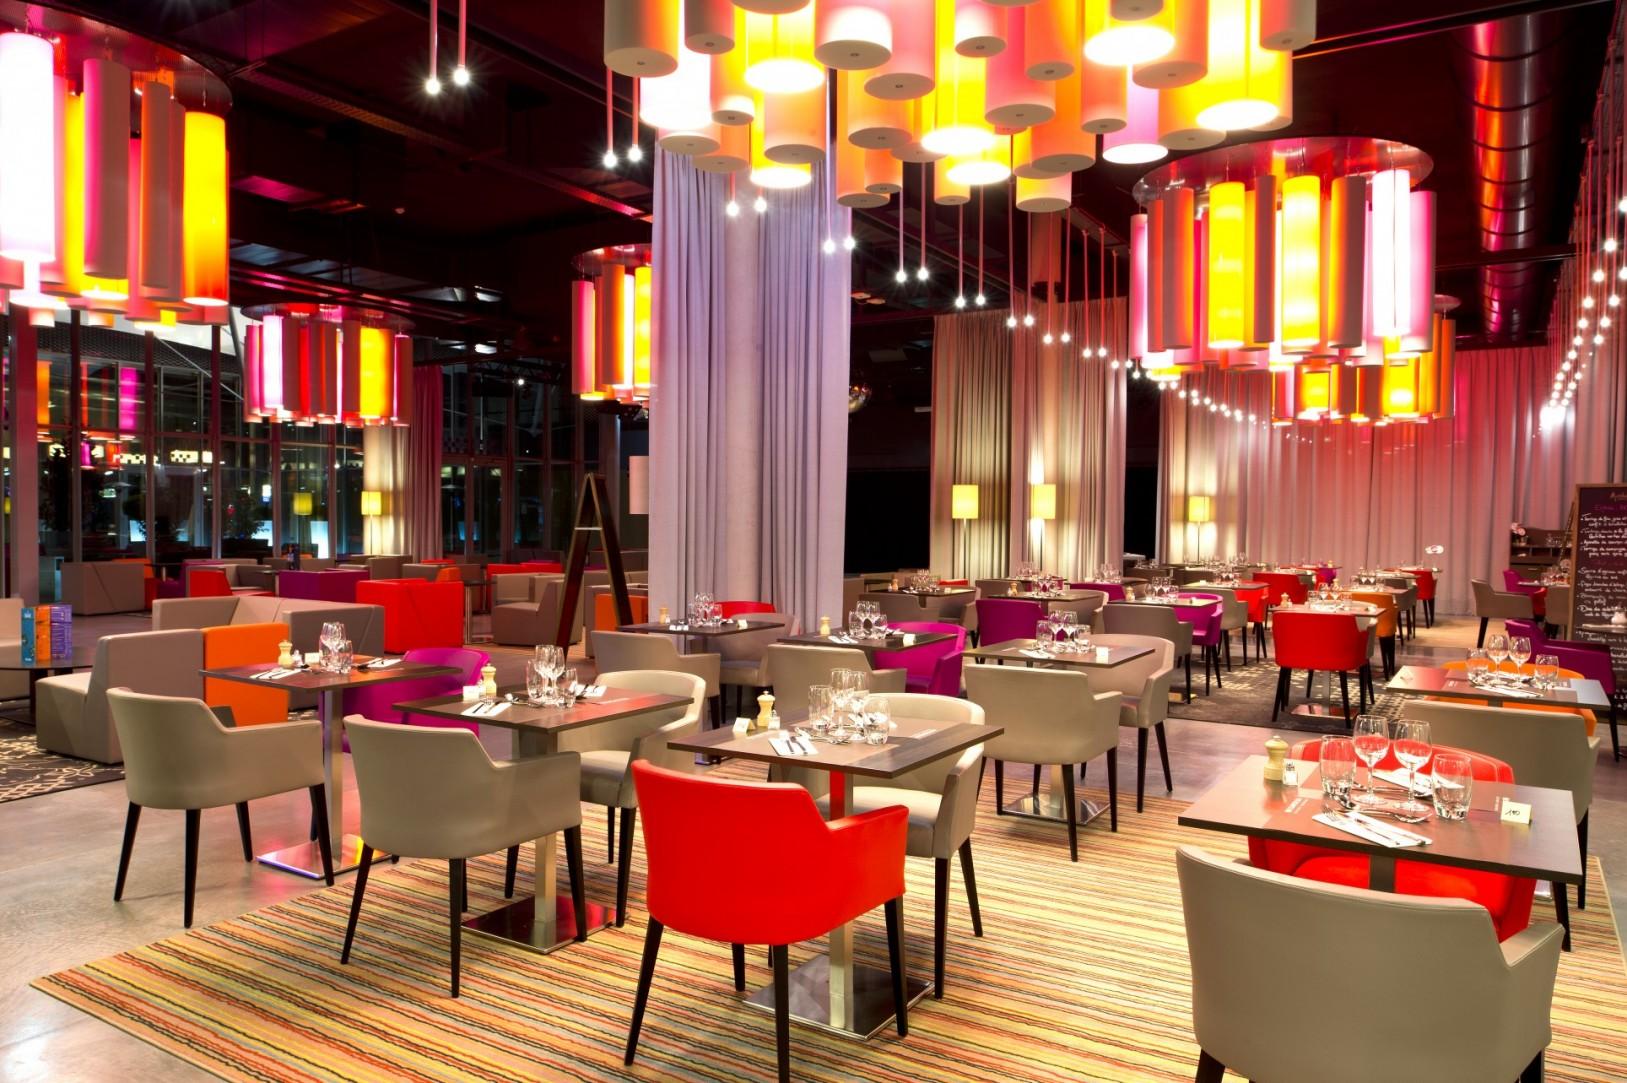 Studio divo restaurant et bar du casino joa montrond for Amenagement restaurant interieur